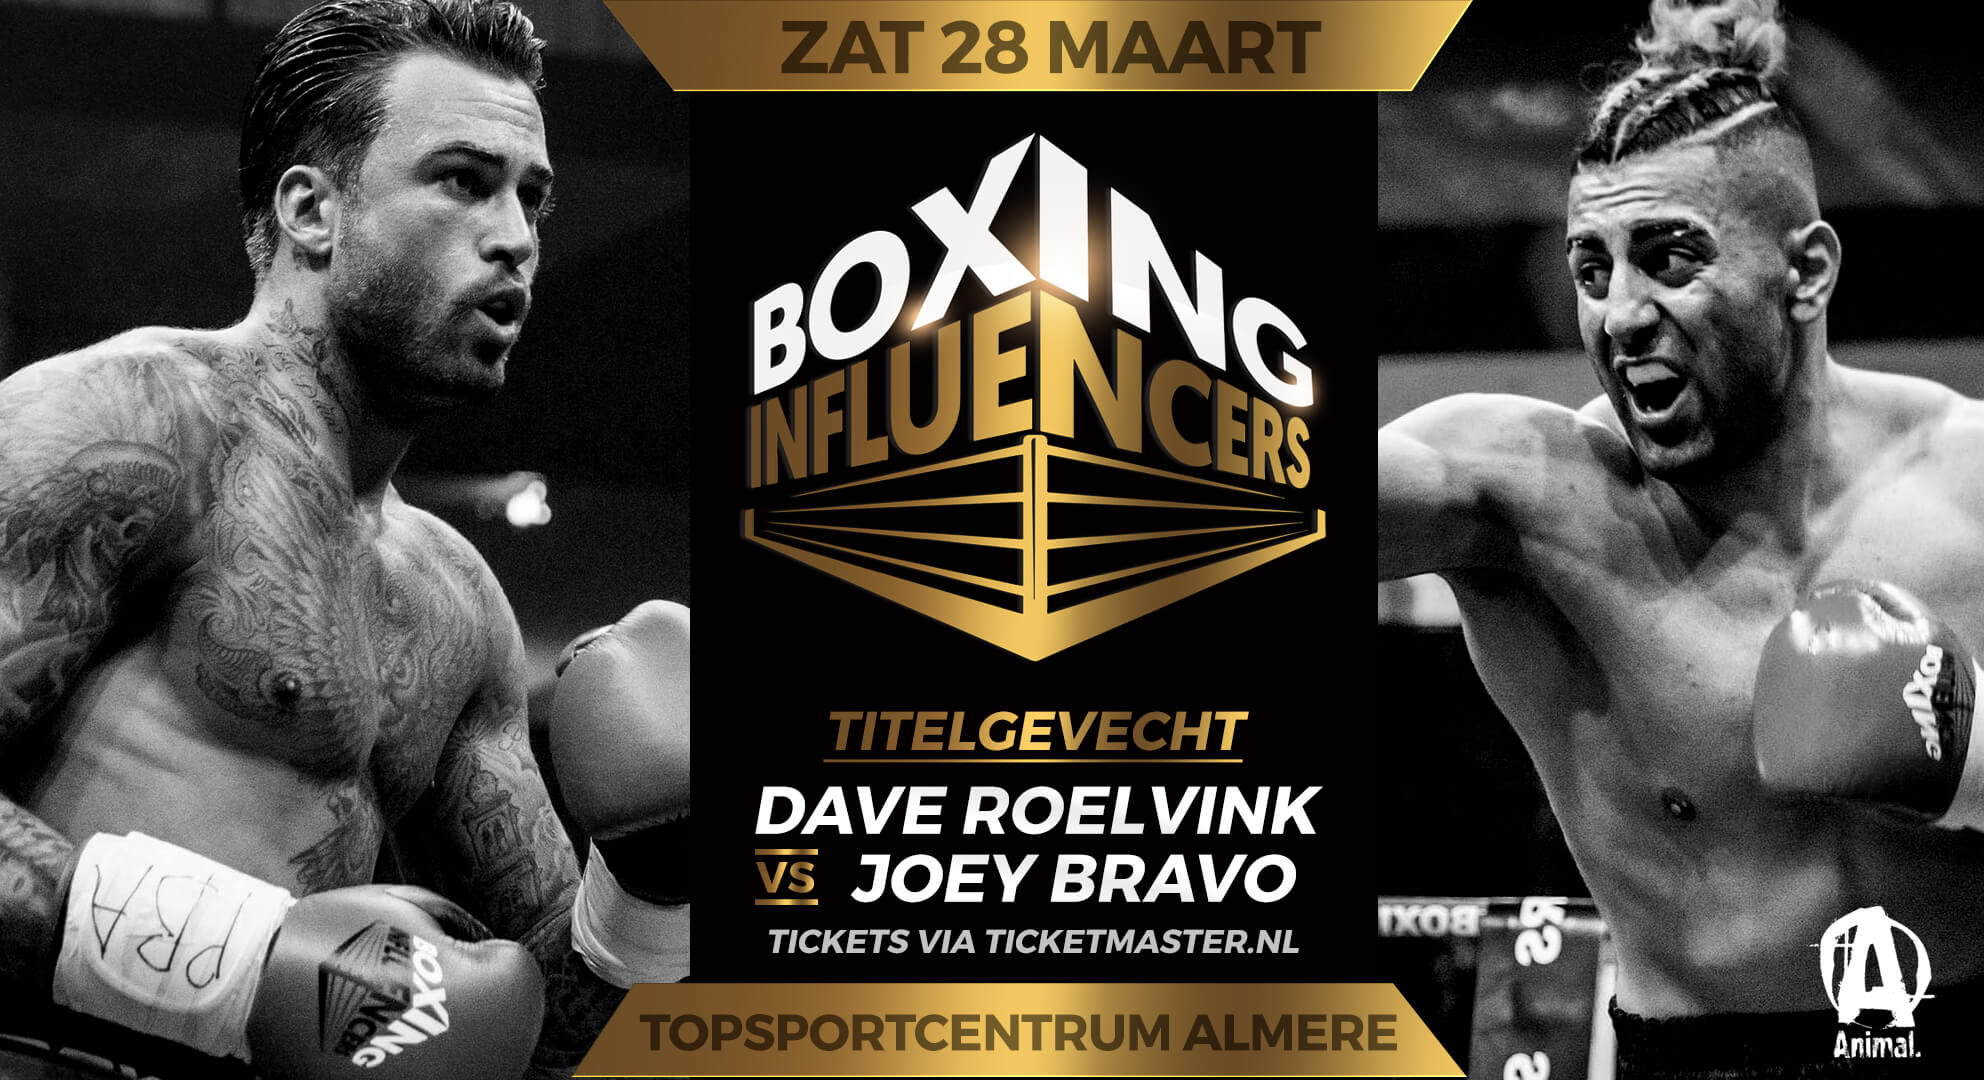 Dave-Roelvink-vs-Joey-Bravo_V3